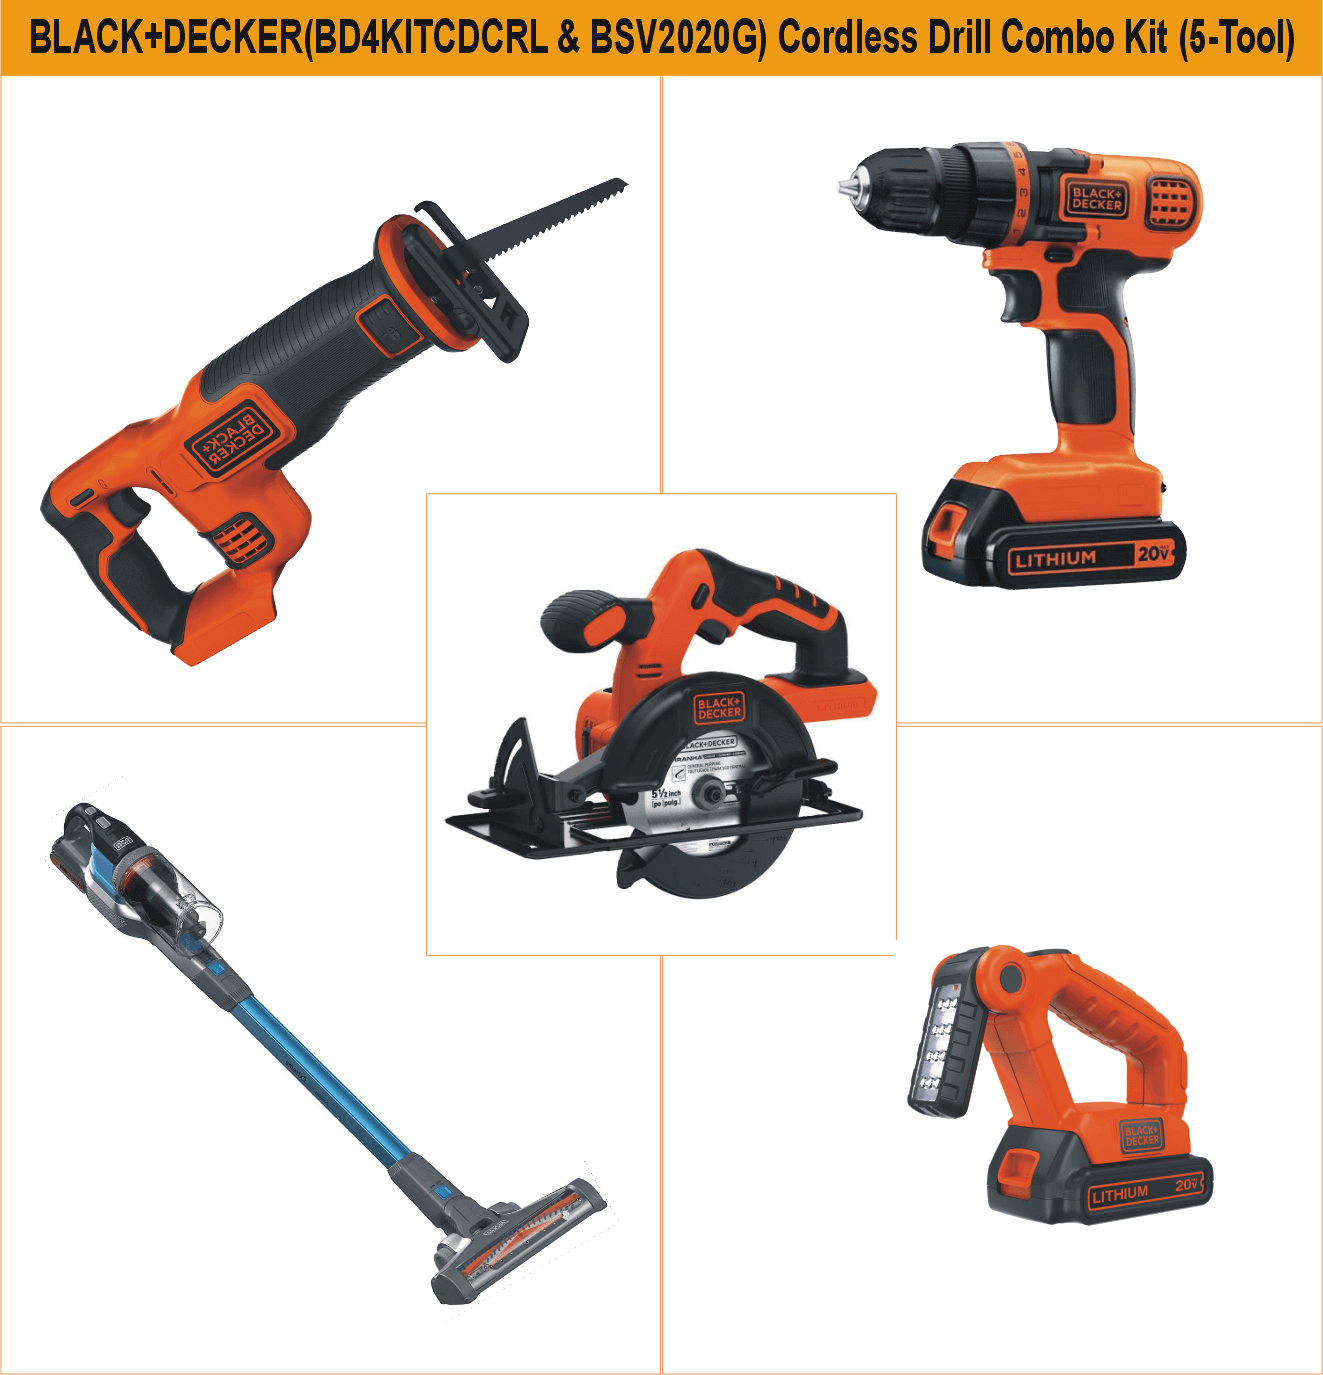 black-decker-bd4kitcdcrl-bsv2020g-20v-max-cordless-drill-combo-kit-with-power-series-extreme-cordless-stick-vacuum